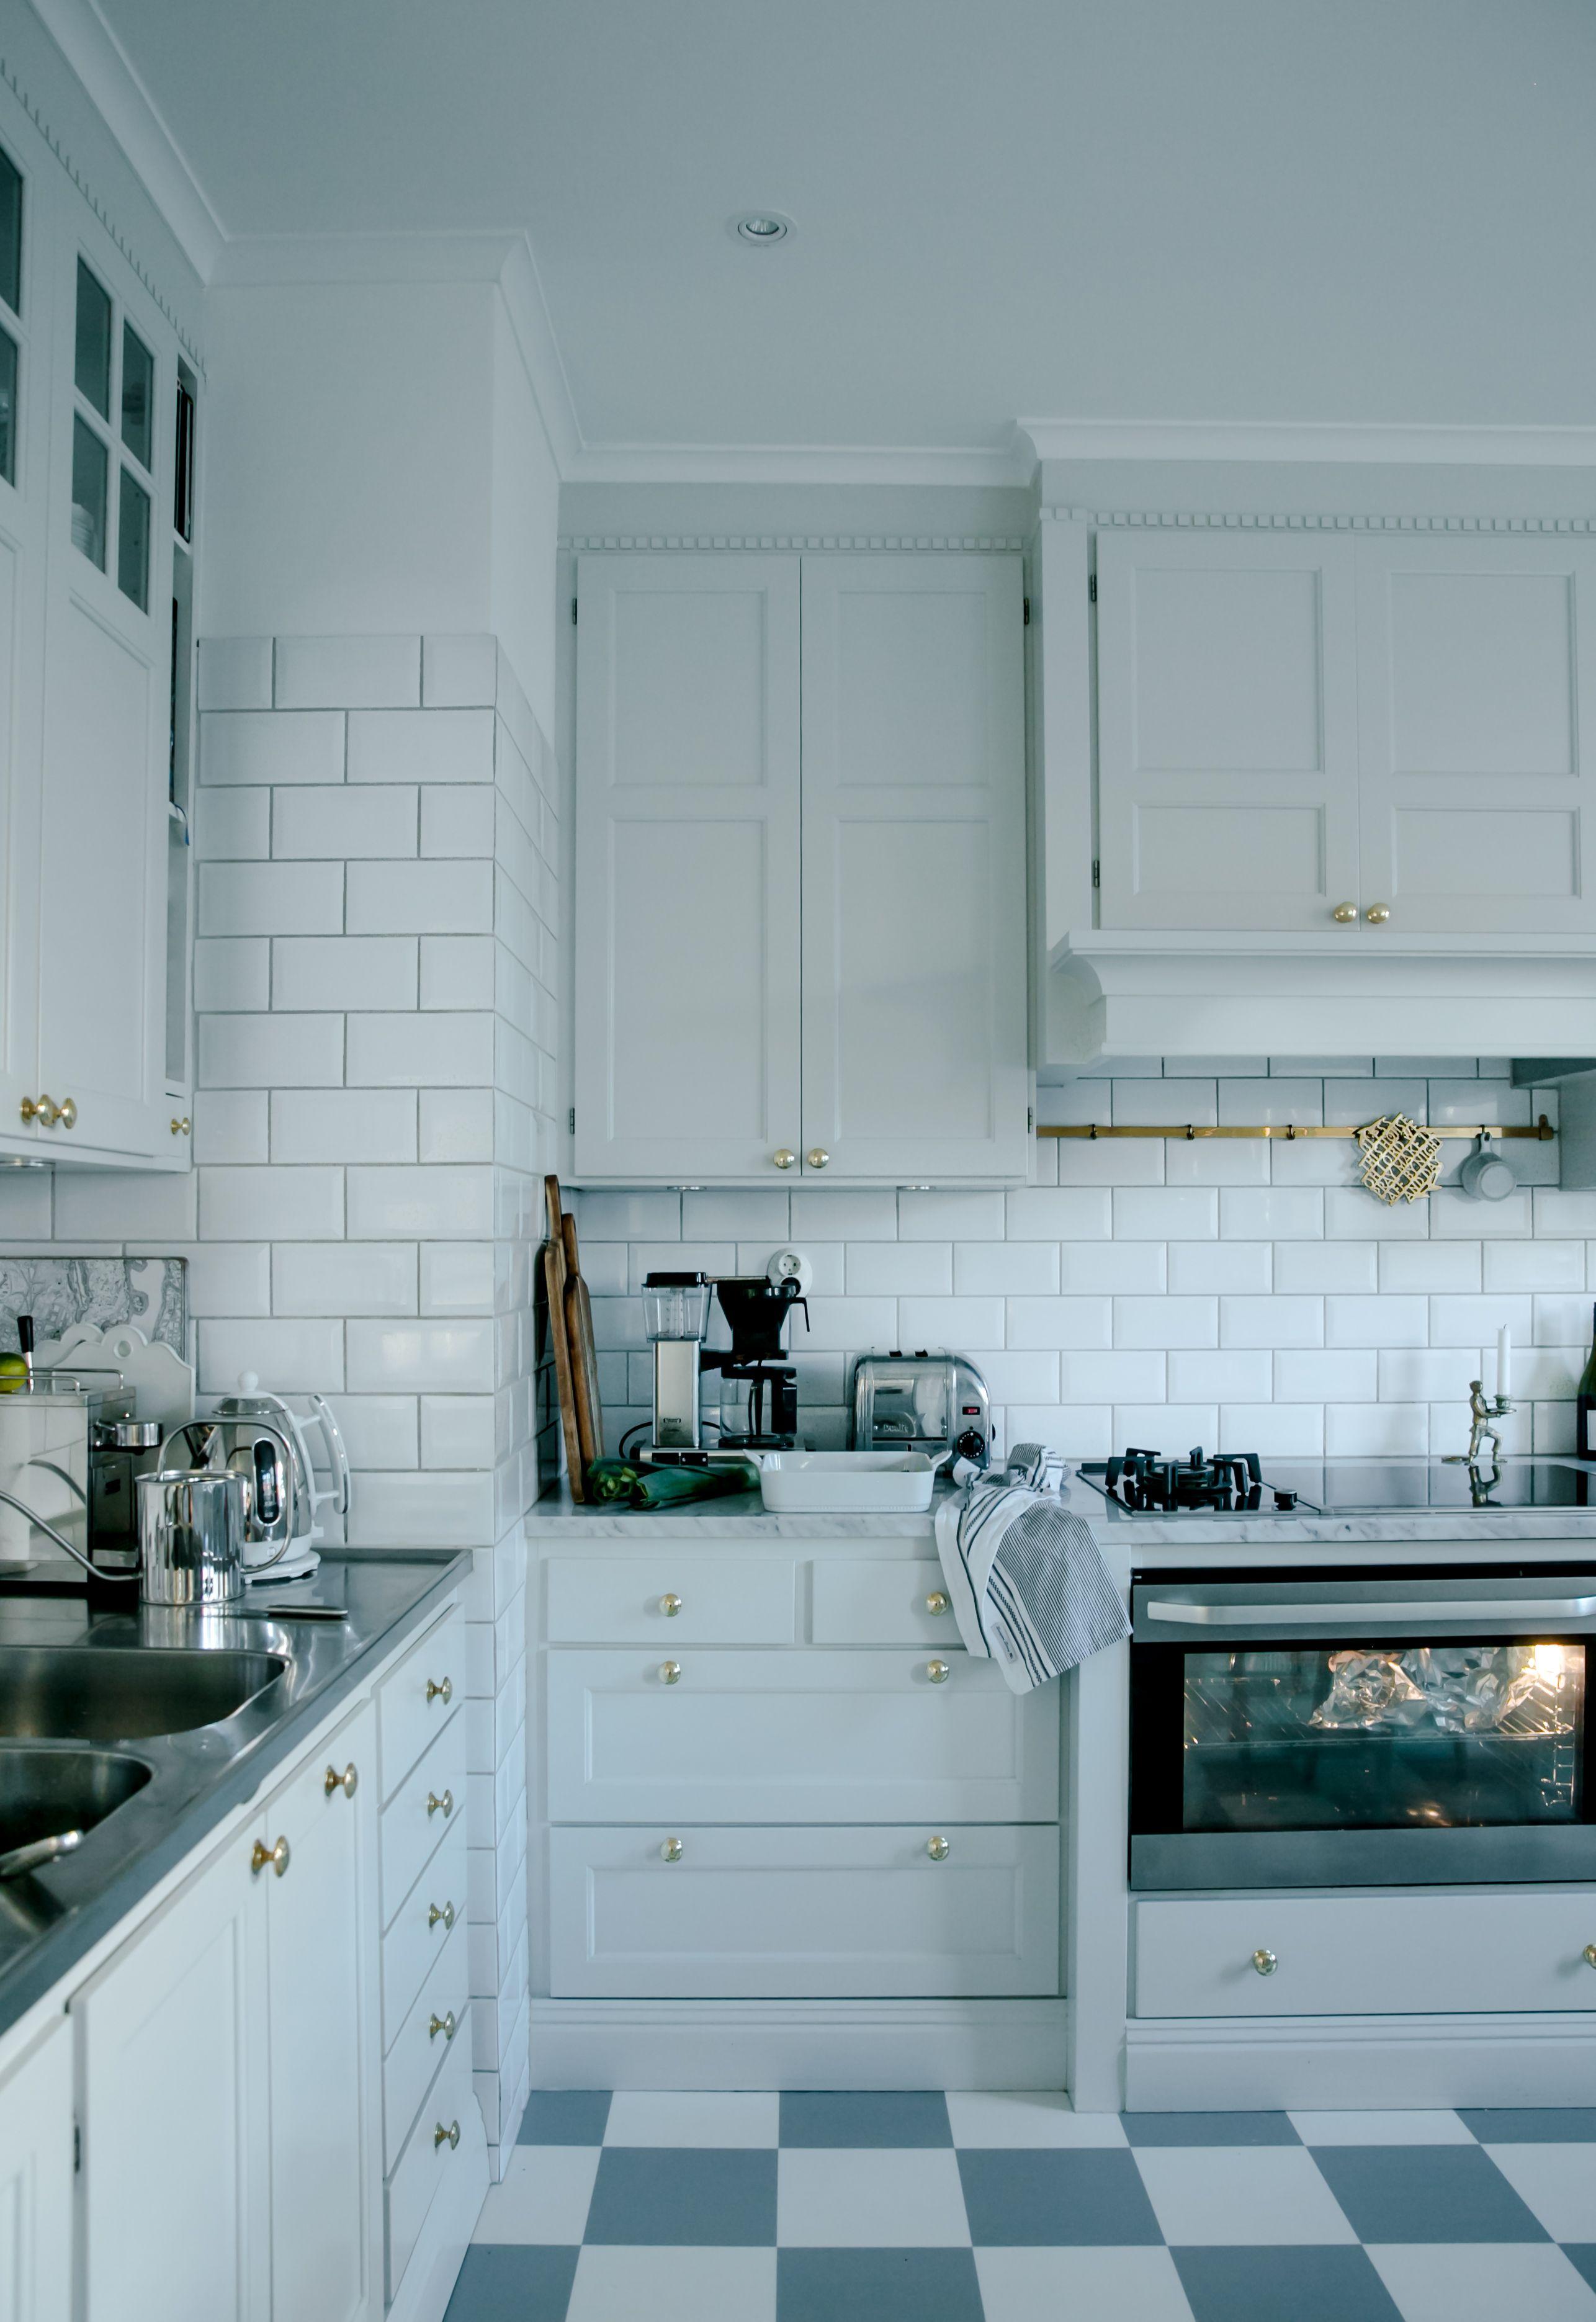 House of Philia   White Kitchen   Pinterest   House and Kitchens